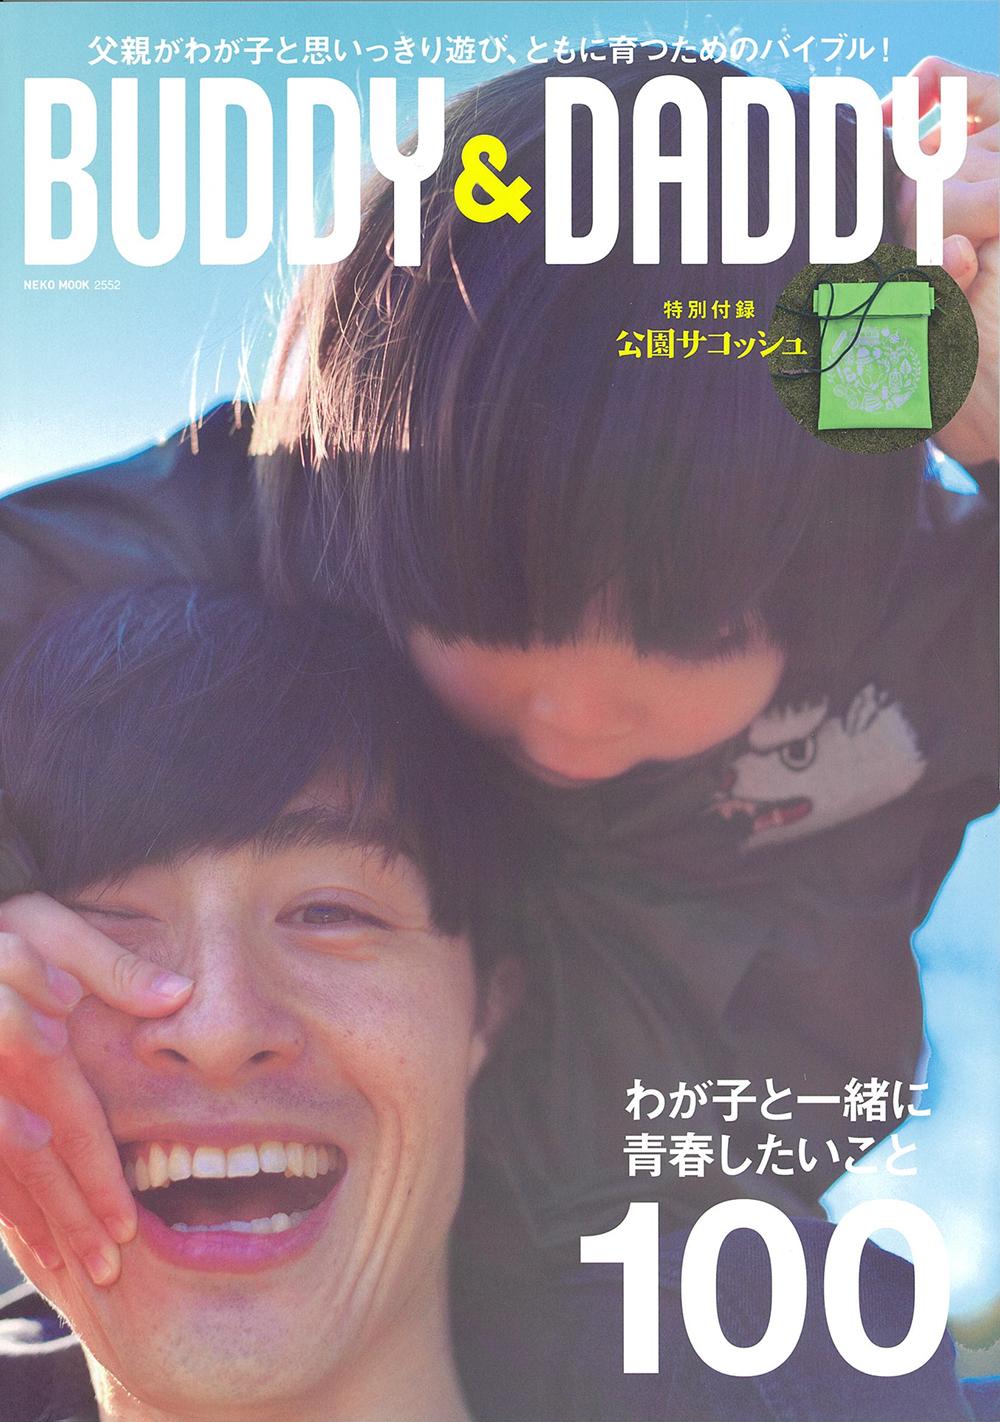 BUDDY&DADDY-COVER.jpg